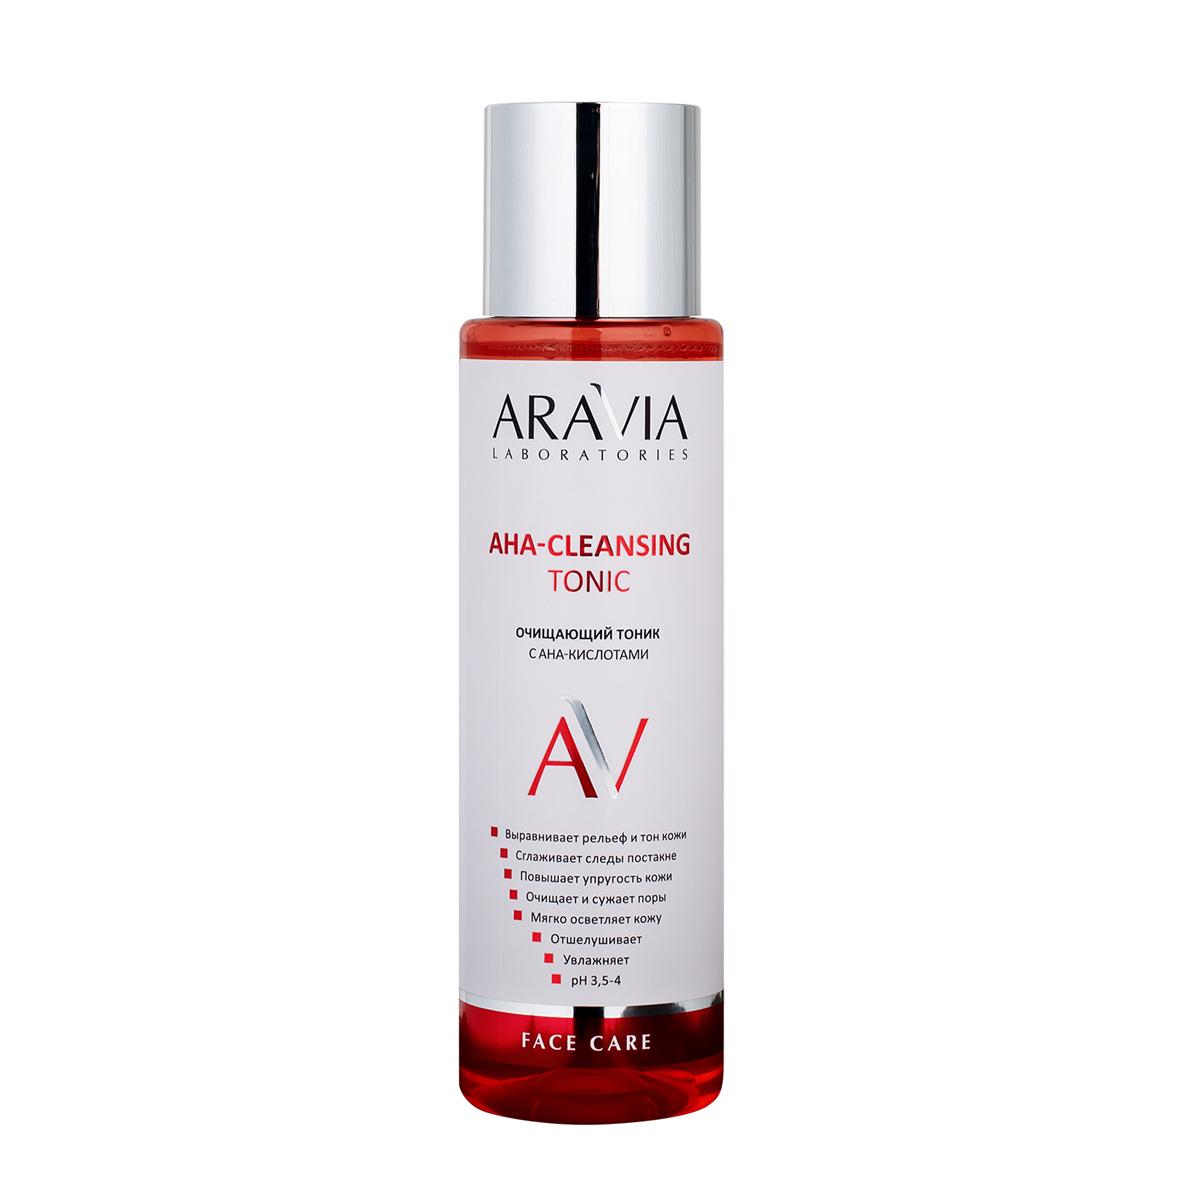 Aravia Laboratories Очищающий тоник с AHA-кислотами, 250 мл (Aravia Laboratories, Уход за лицом)